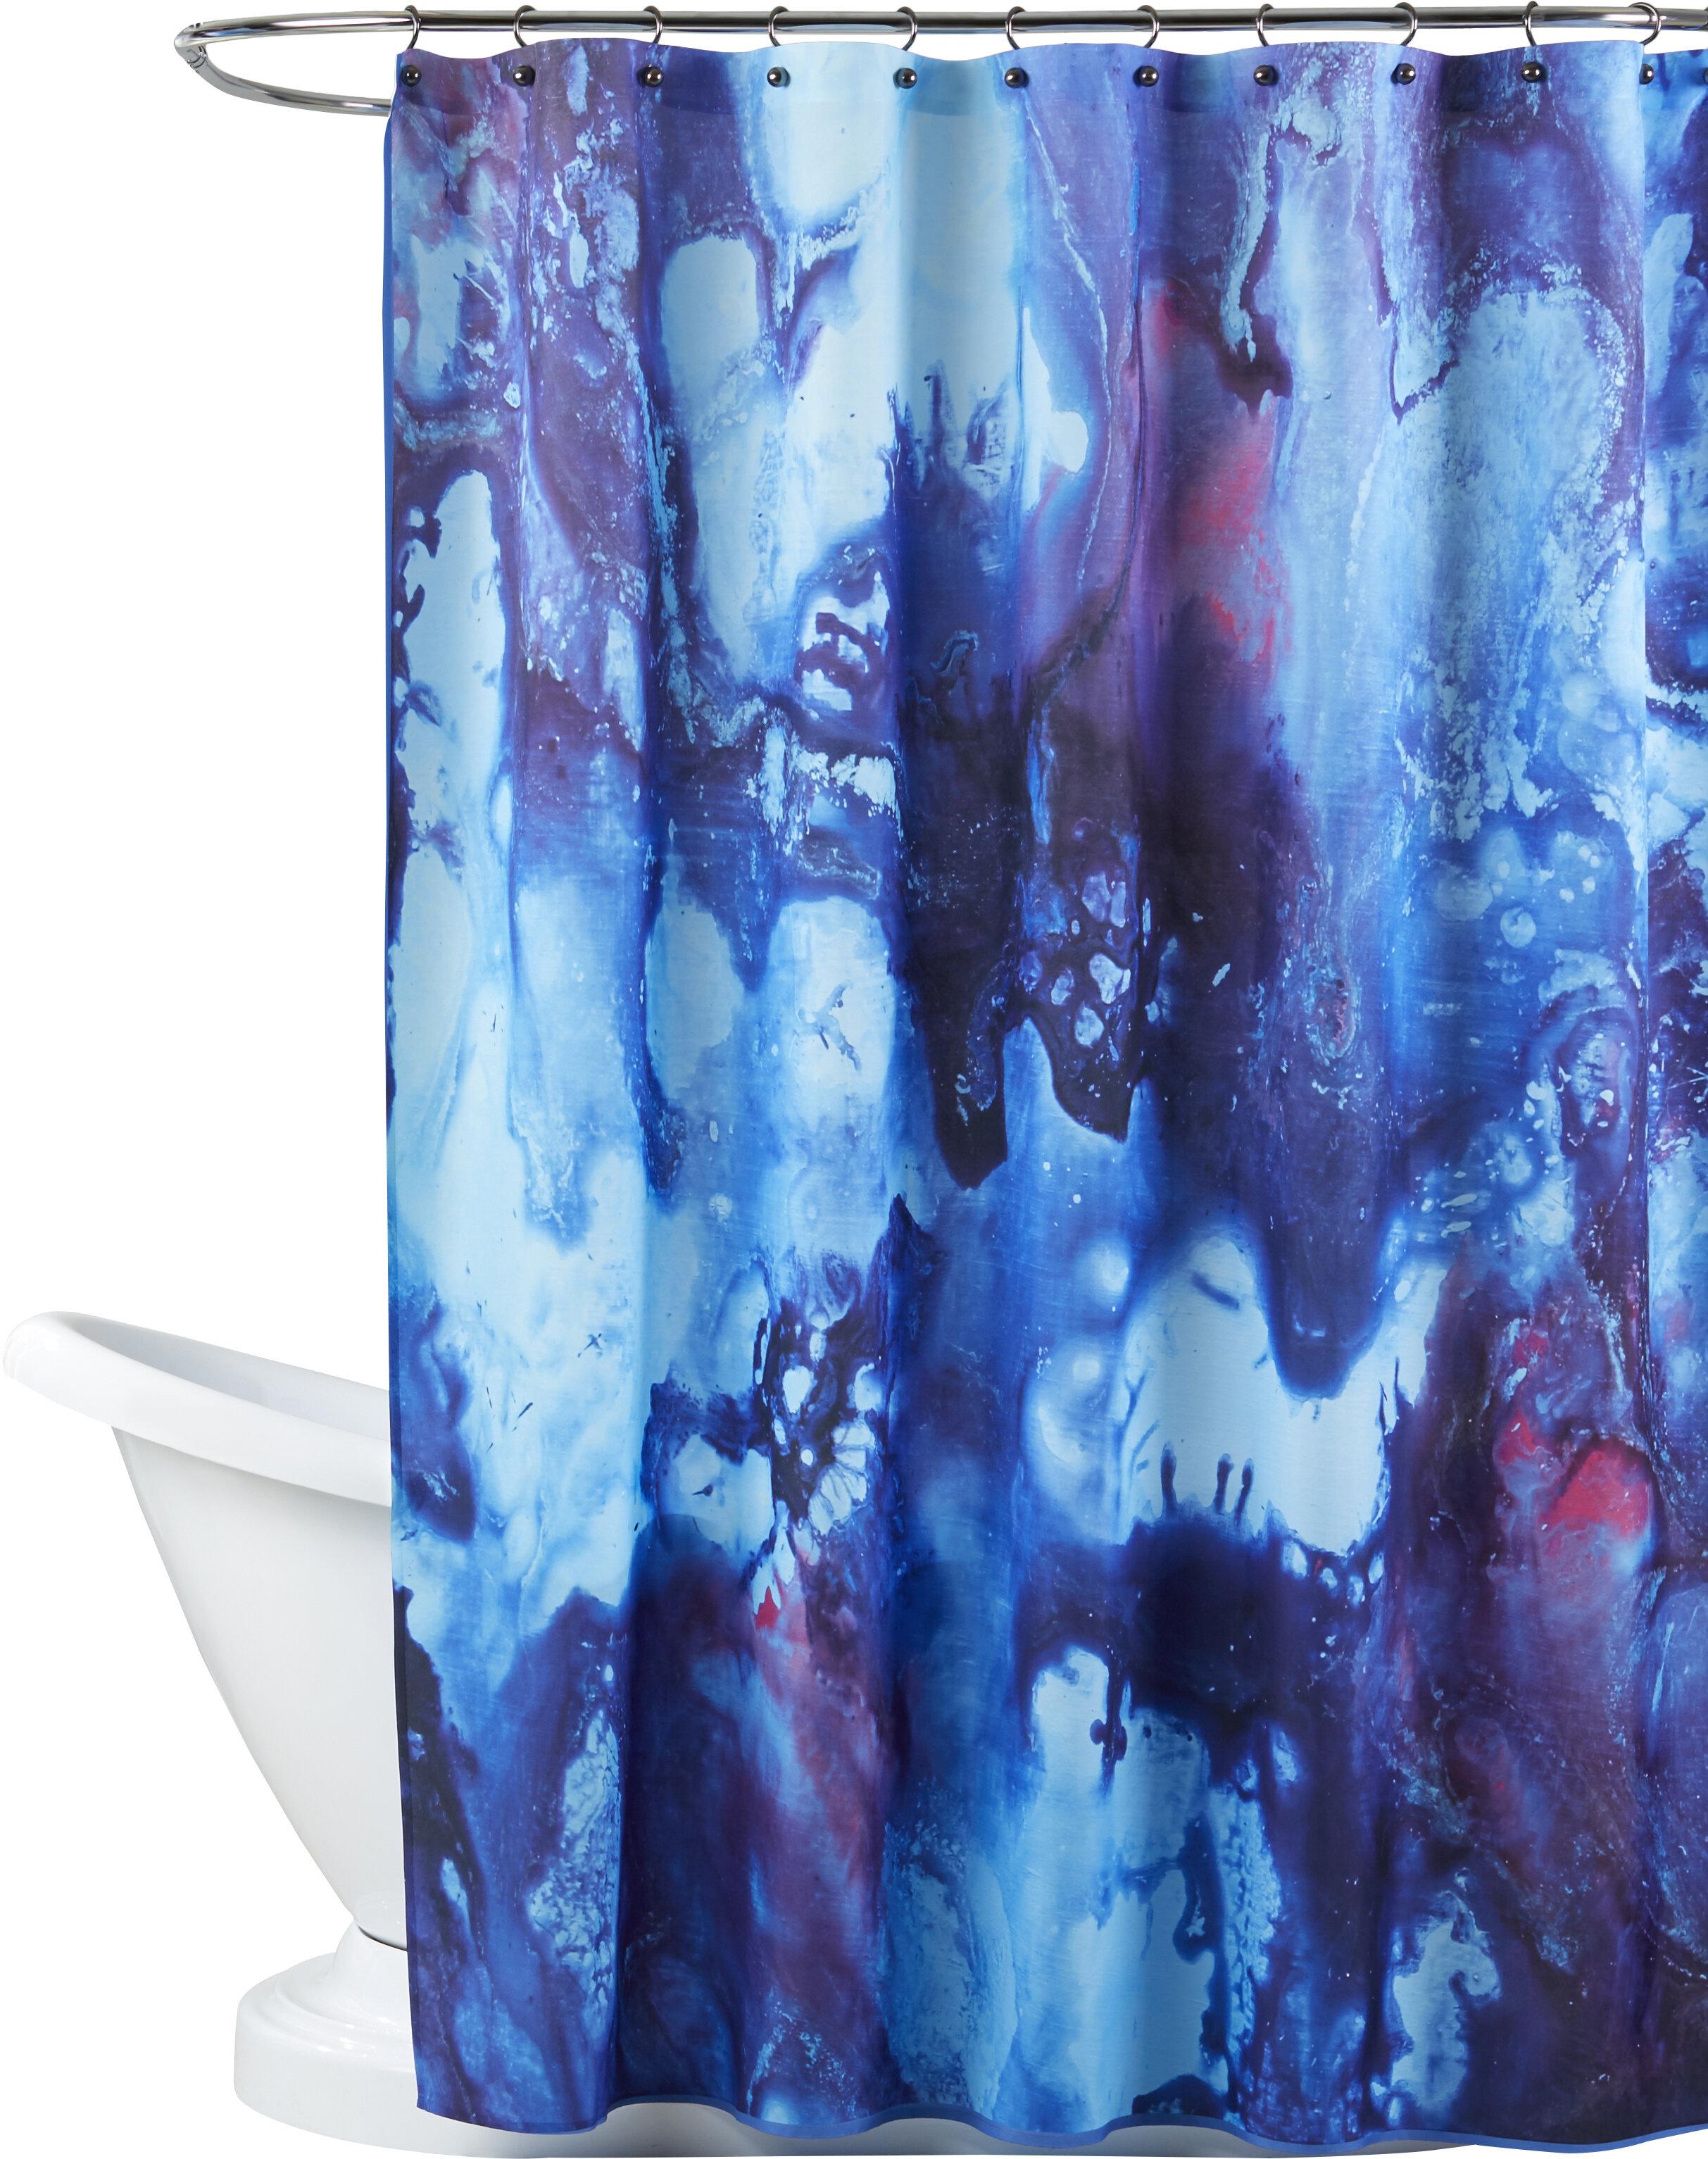 Brayden Studio Deb Mcnaughton Ink Single Shower Curtain Wayfair